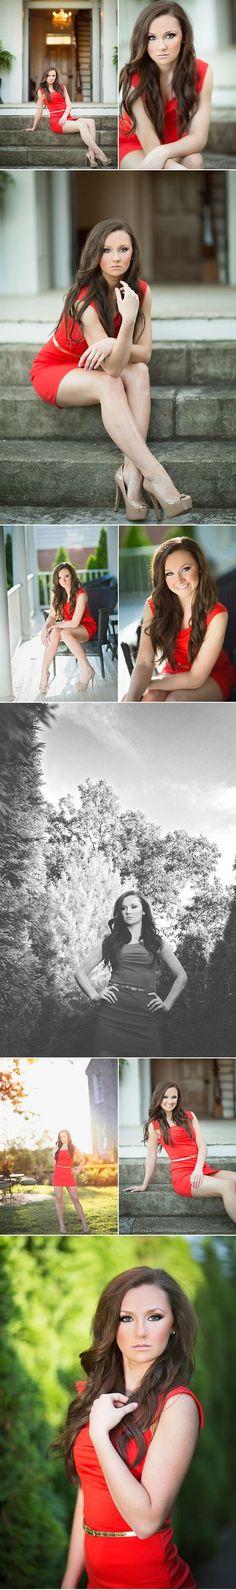 Eva | d-Squared Designs St. Genevieve | Missouri Senior Photography